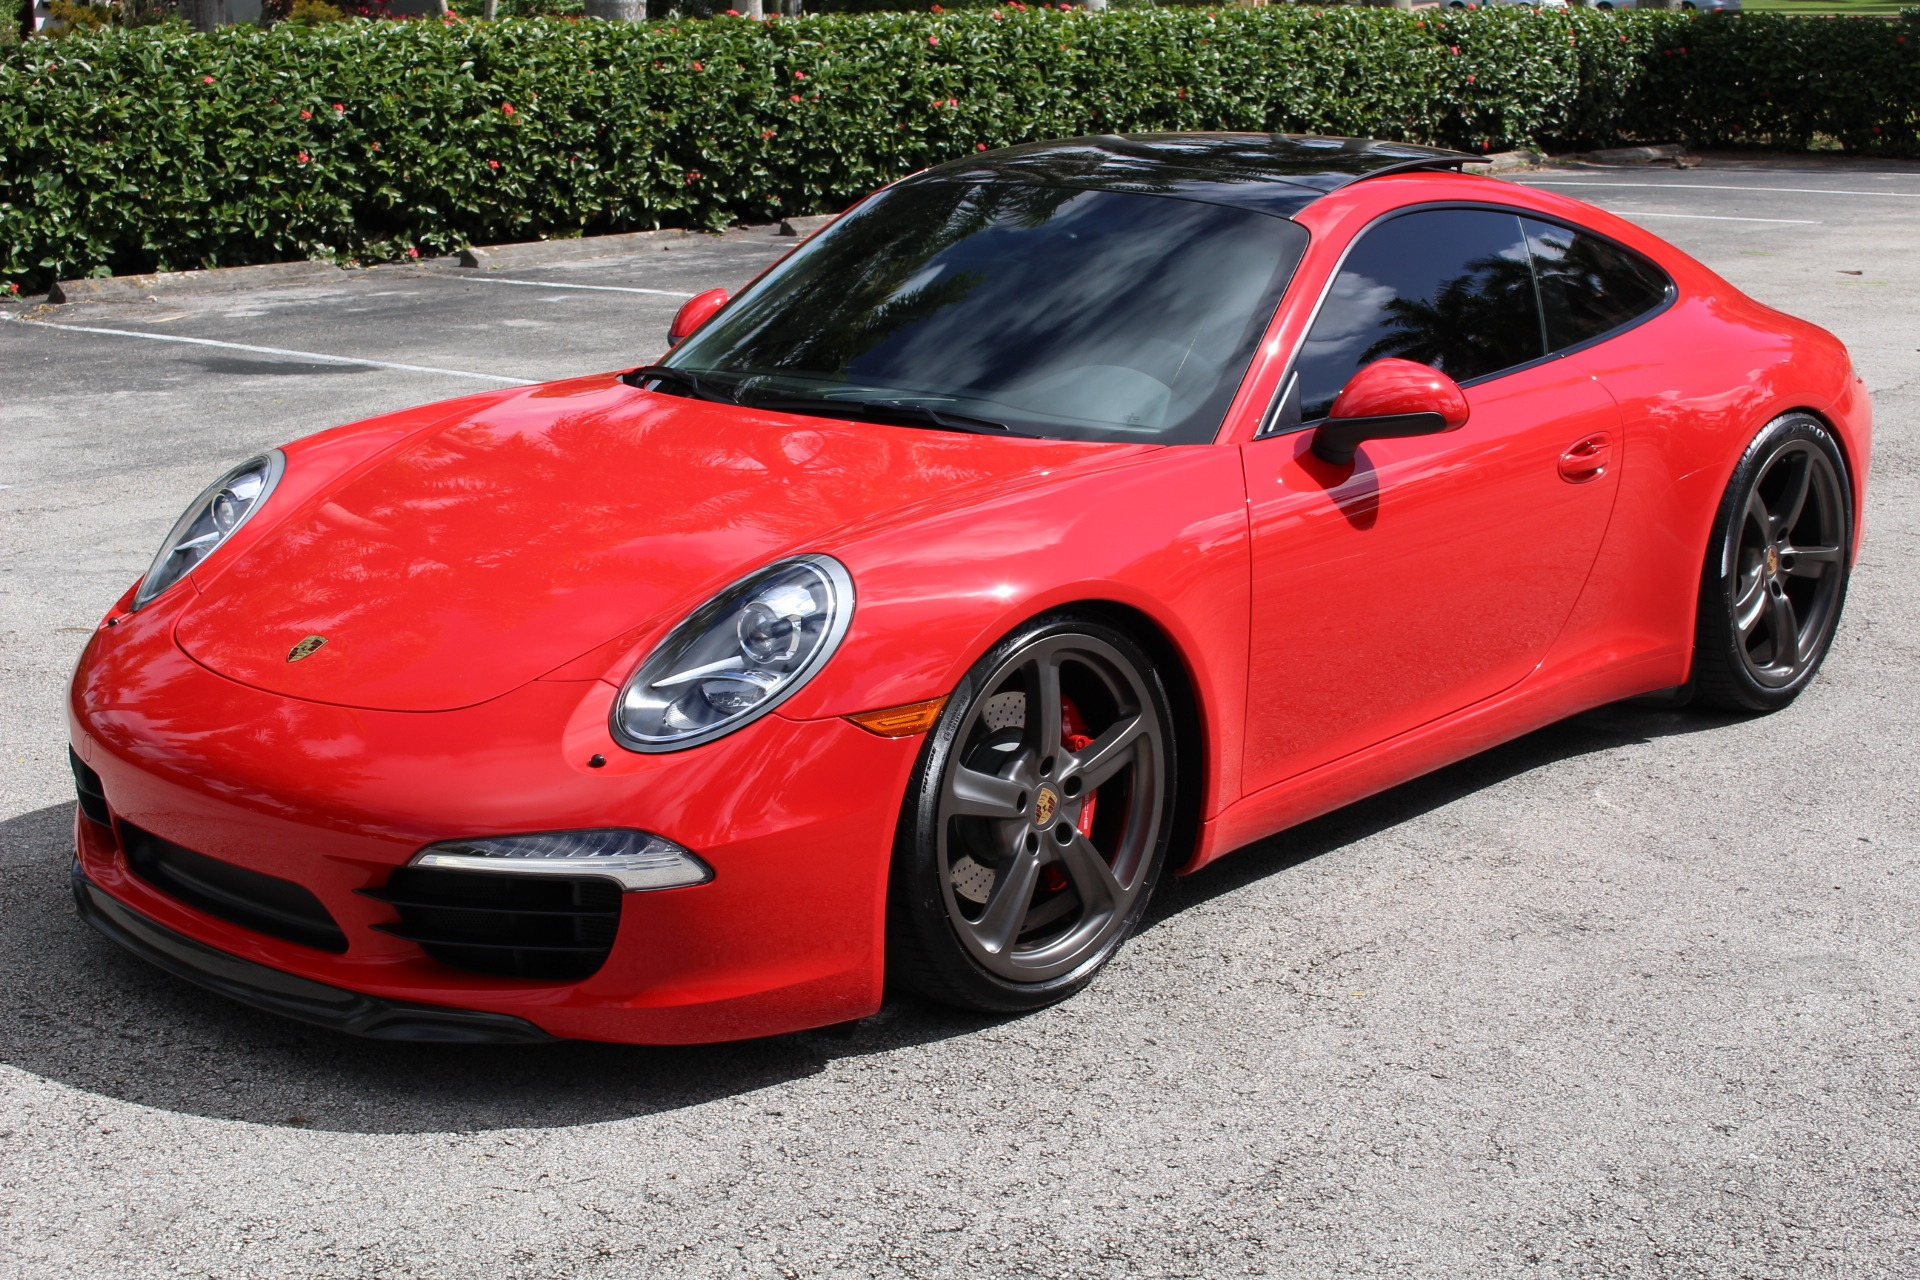 Used 2013 Porsche 911 Carrera S for sale $72,850 at The Gables Sports Cars in Miami FL 33146 2